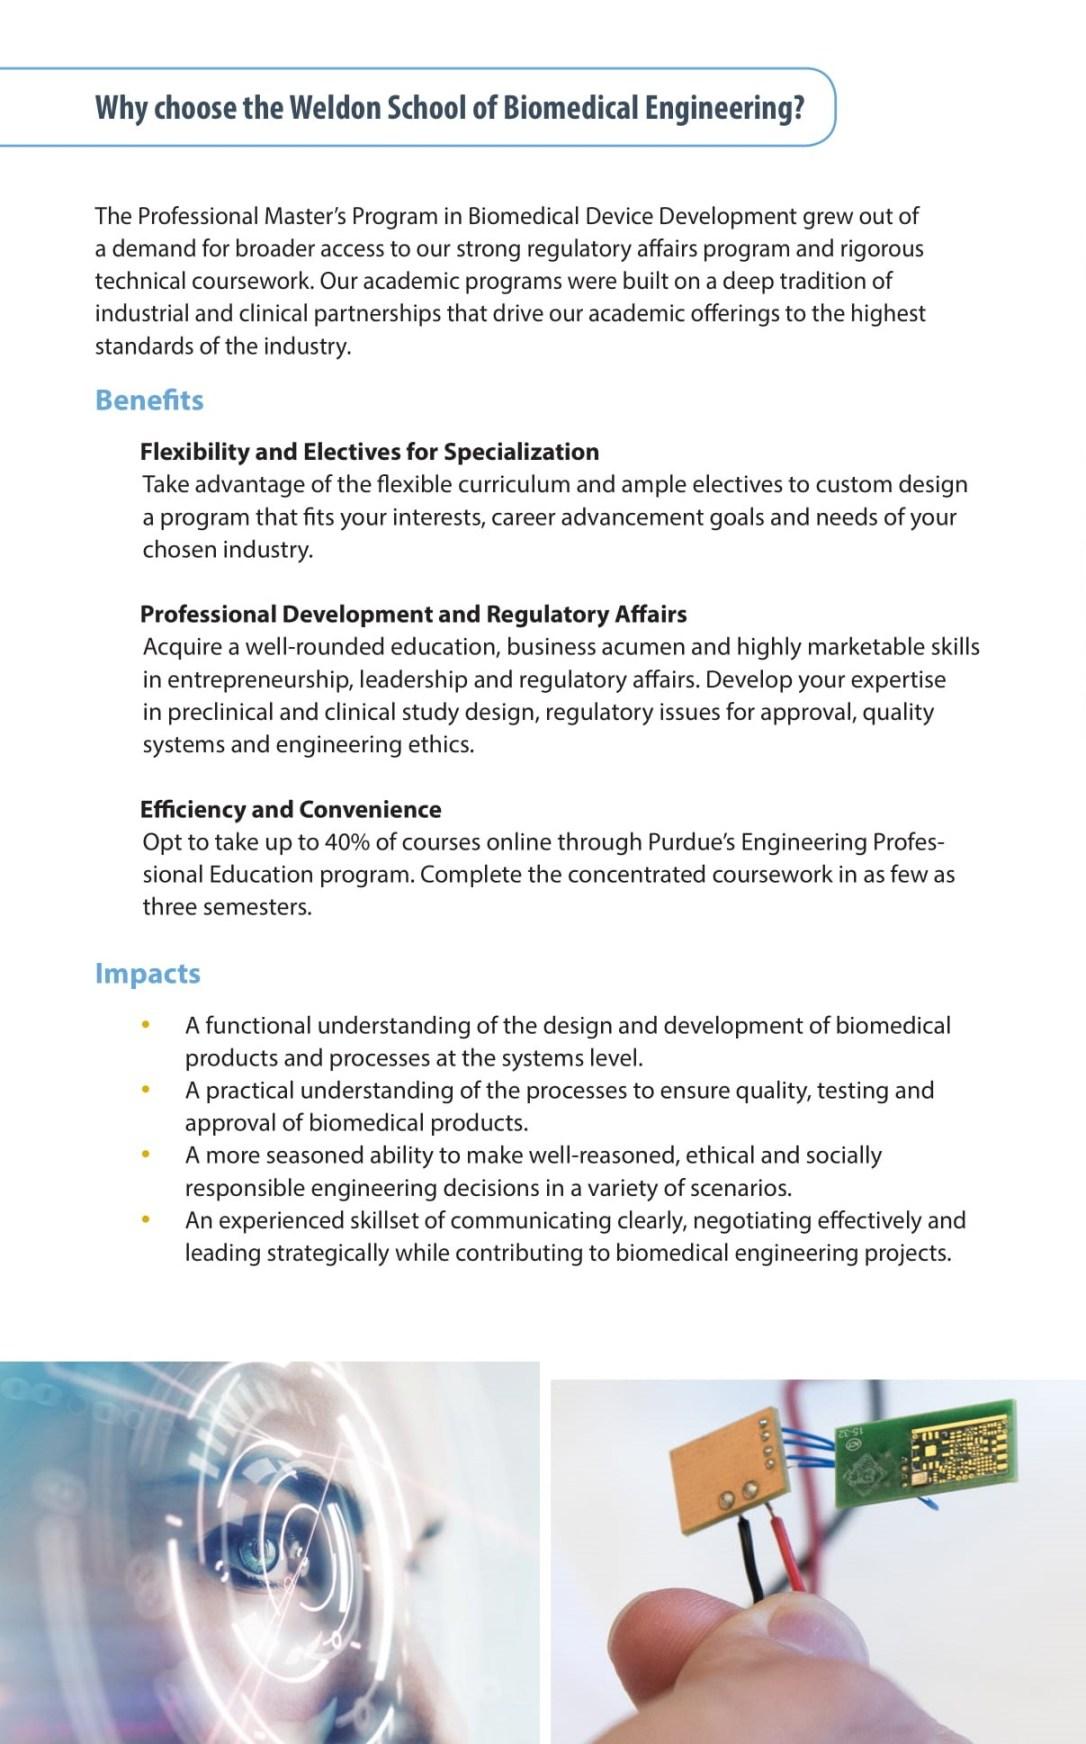 ENGS-18-11359 BME Masters Program Brochure SPLIT 04